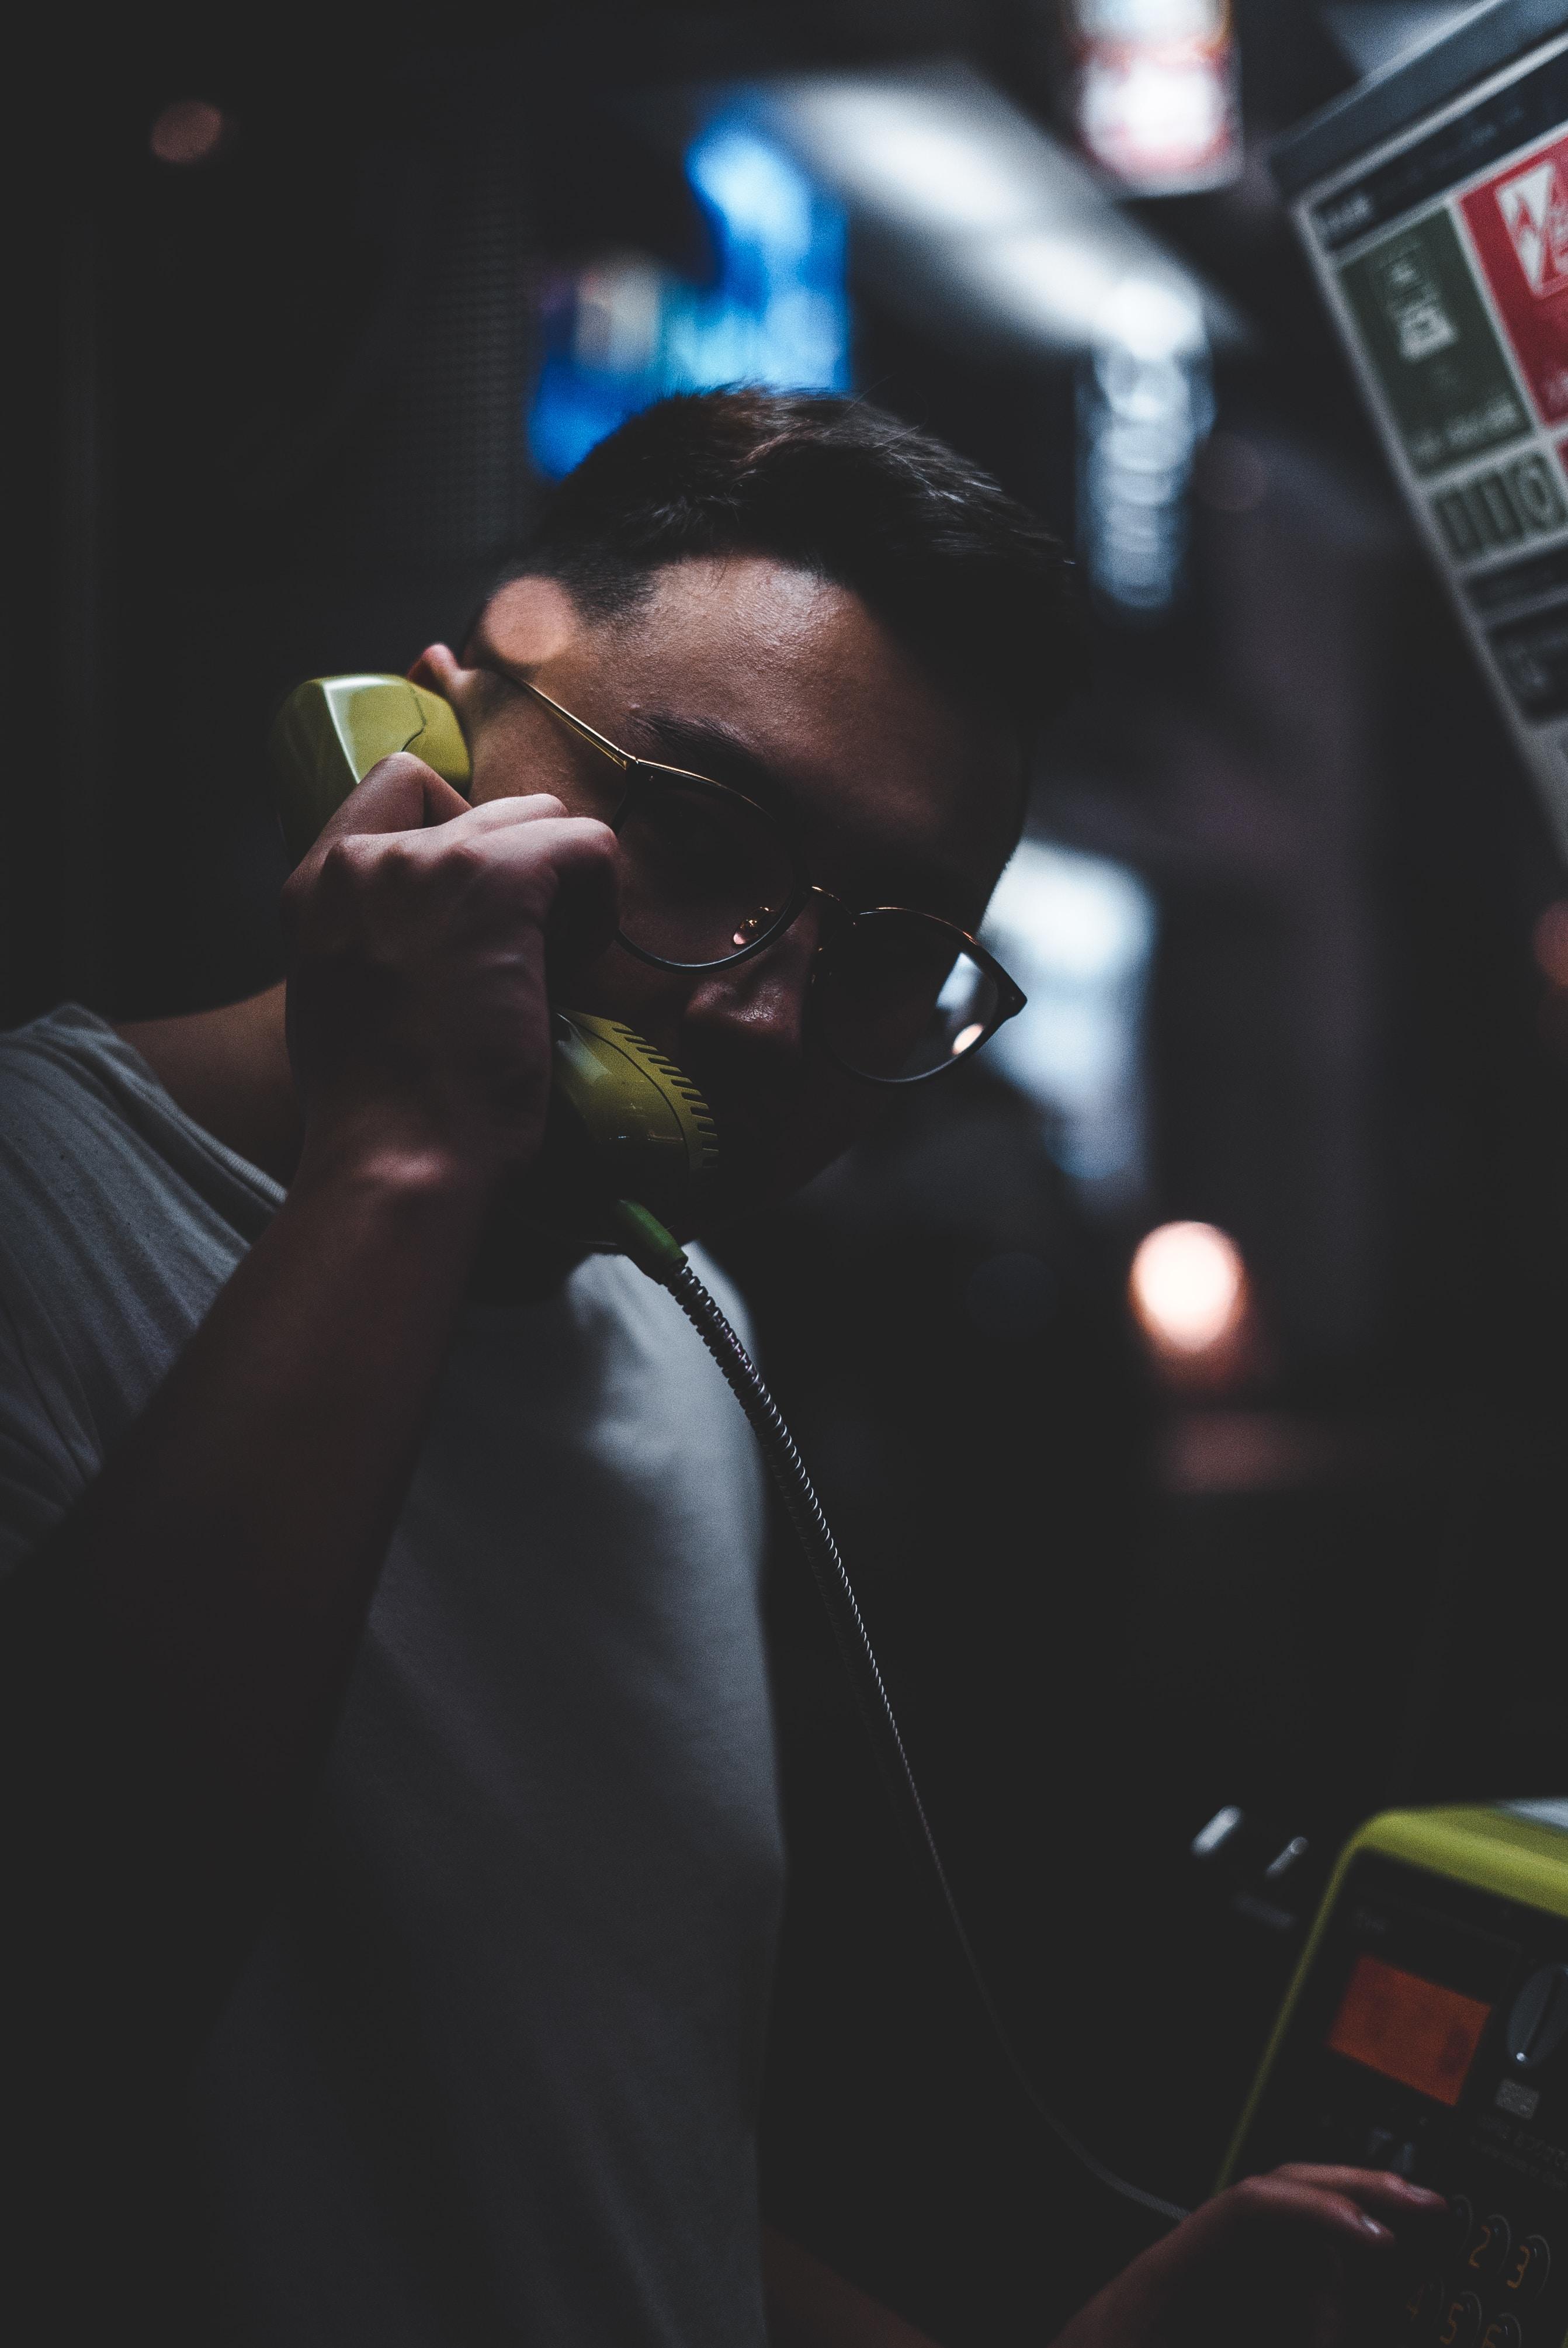 man standing holding telephone